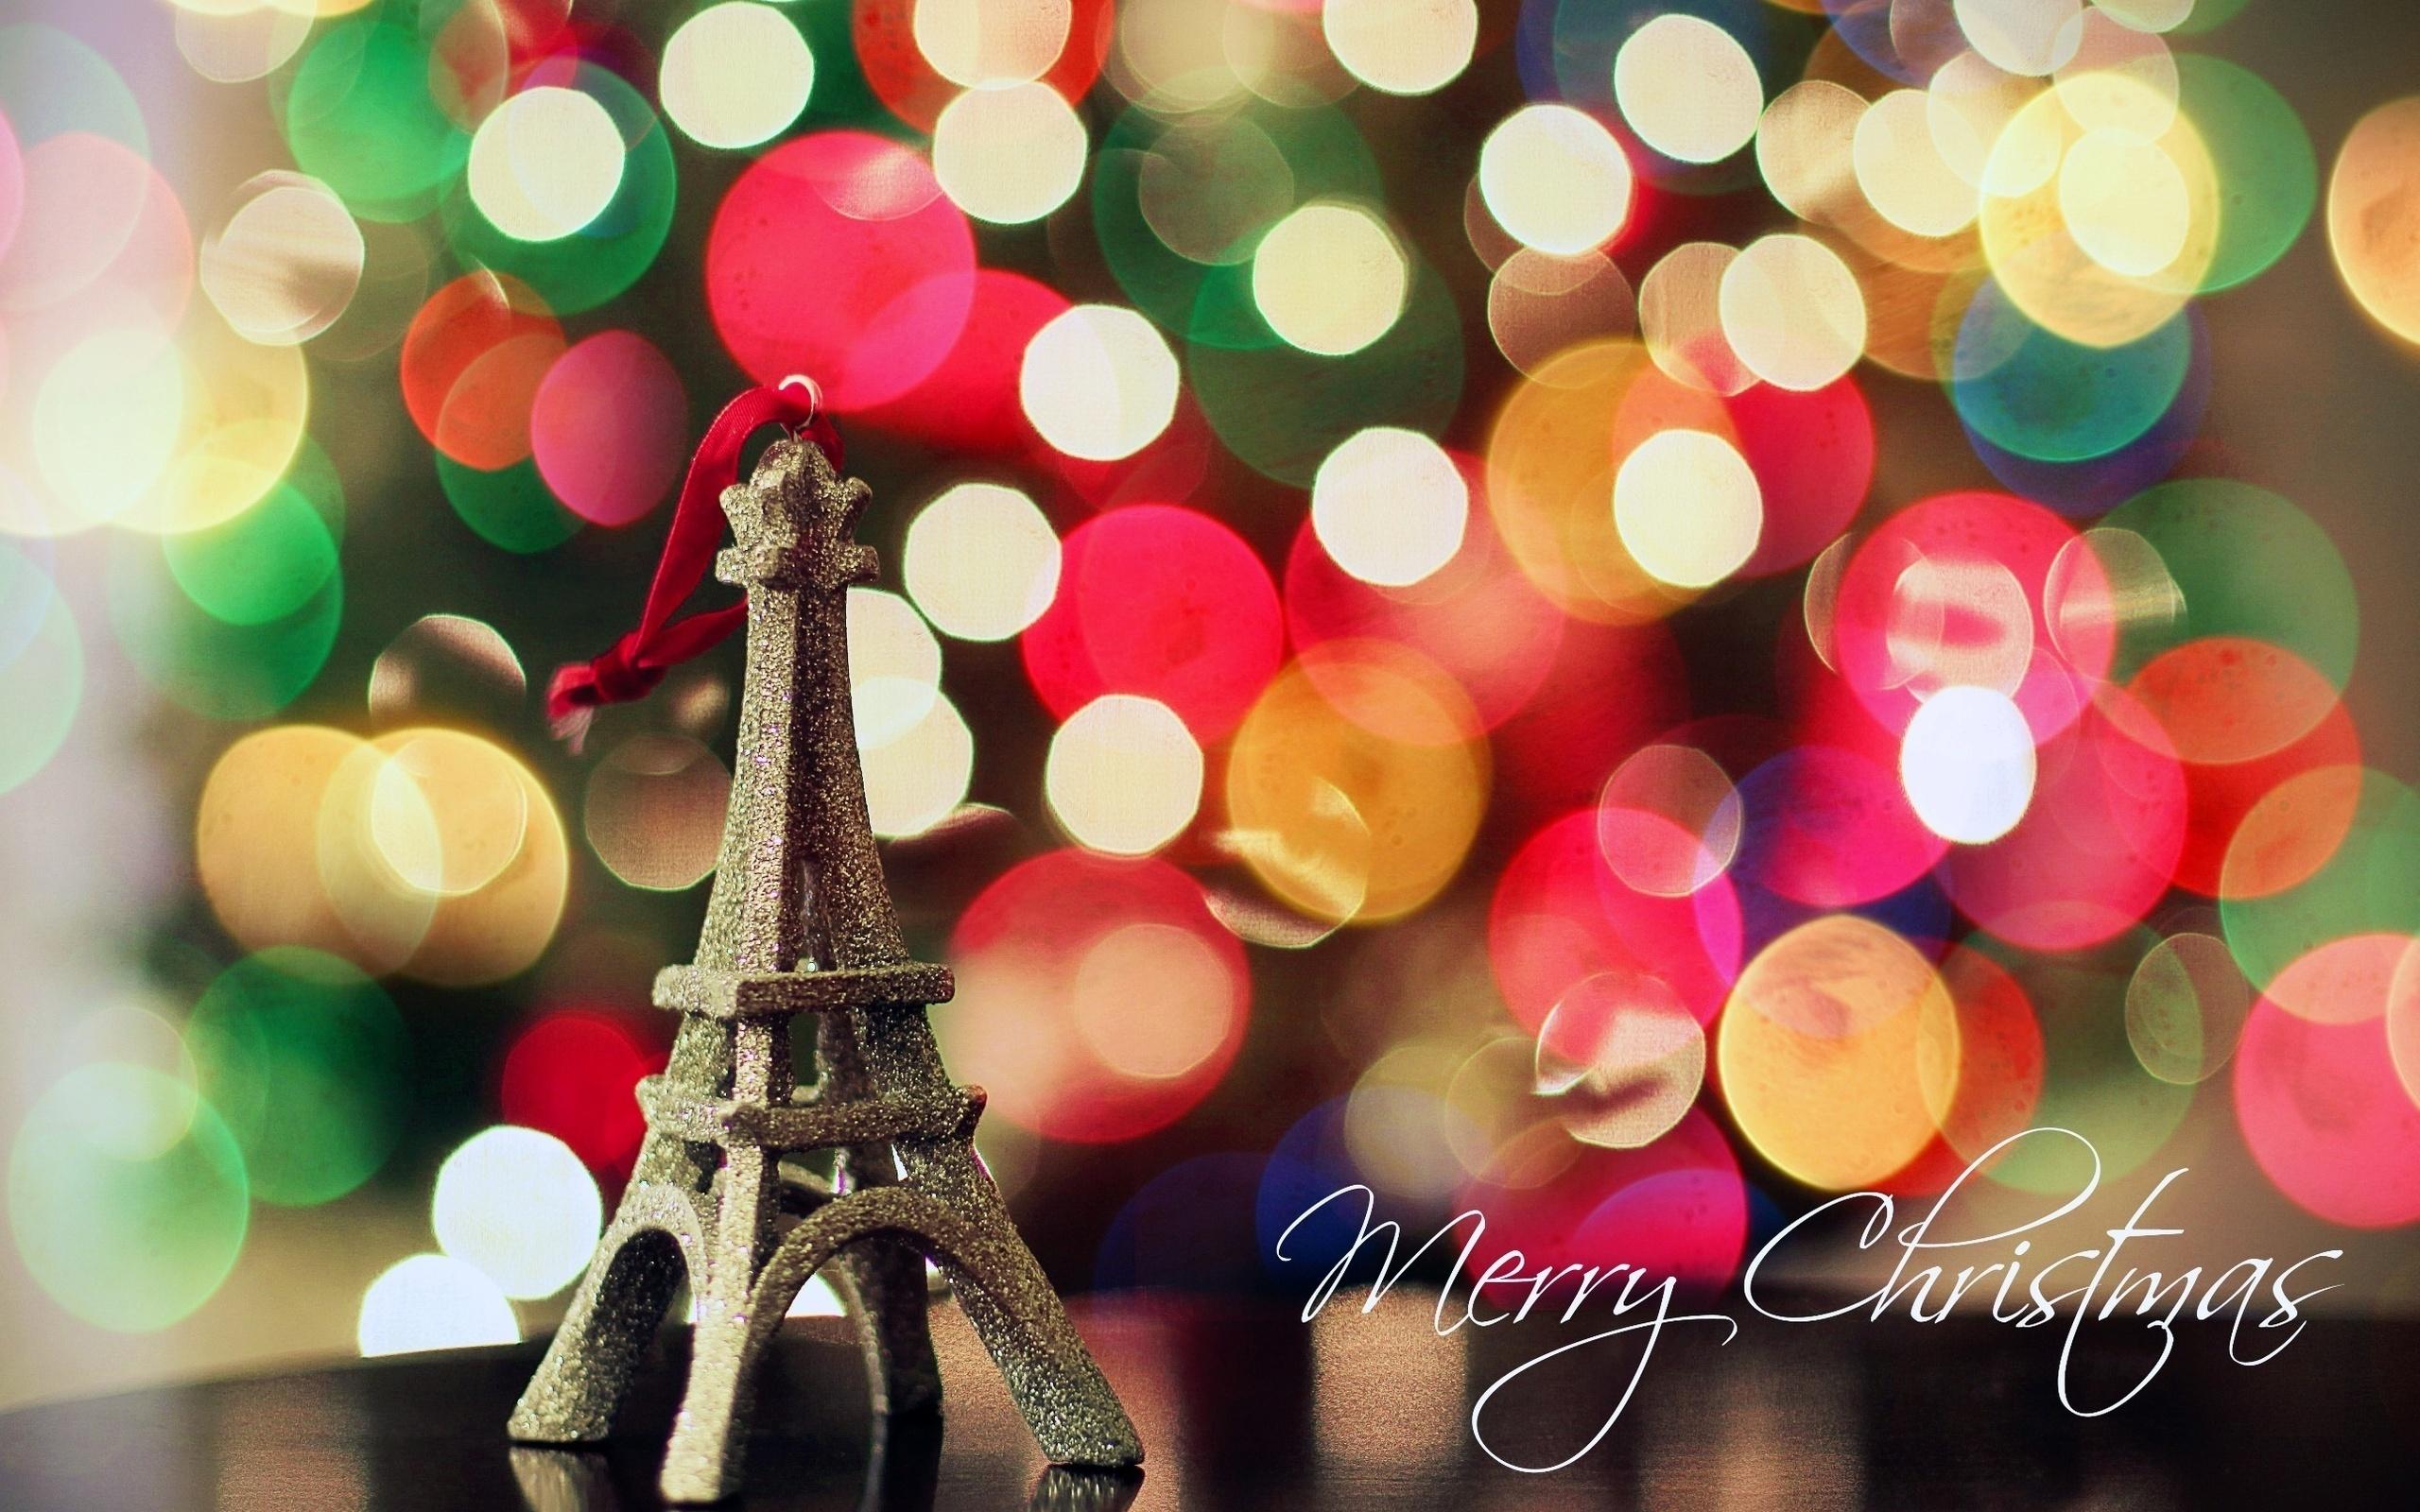 3d Xmas Tree Live Wallpaper Merry Christmas Wallpapers Paris Hd Desktop Wallpapers